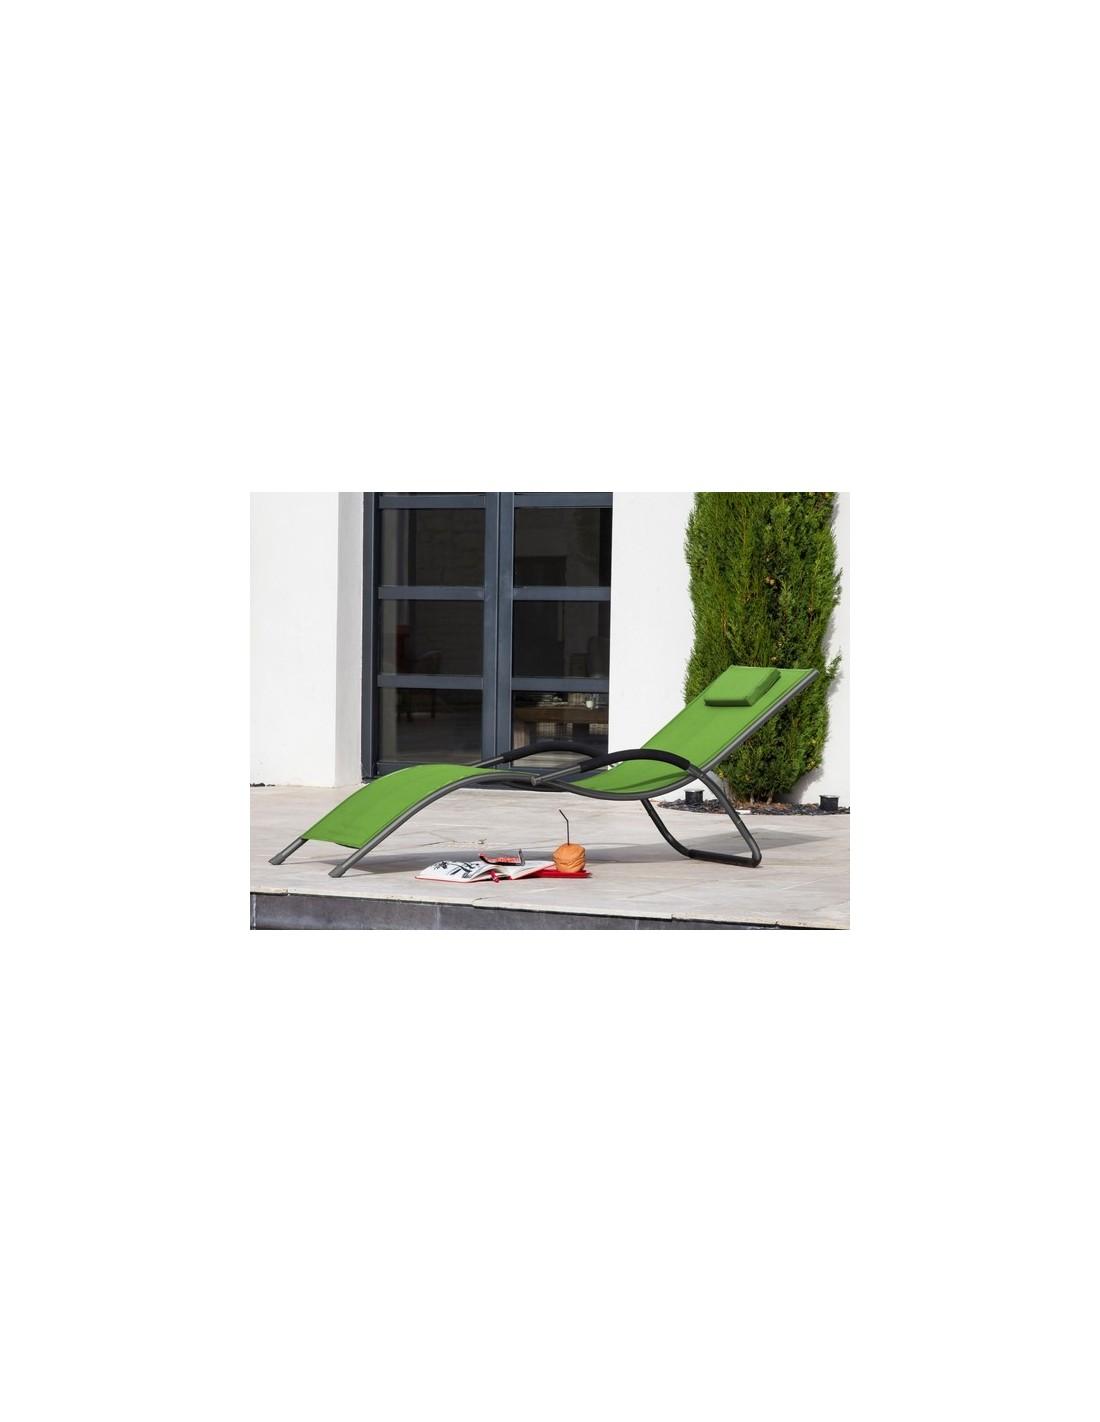 lit de soleil riva vendu par 2 proloisirs. Black Bedroom Furniture Sets. Home Design Ideas